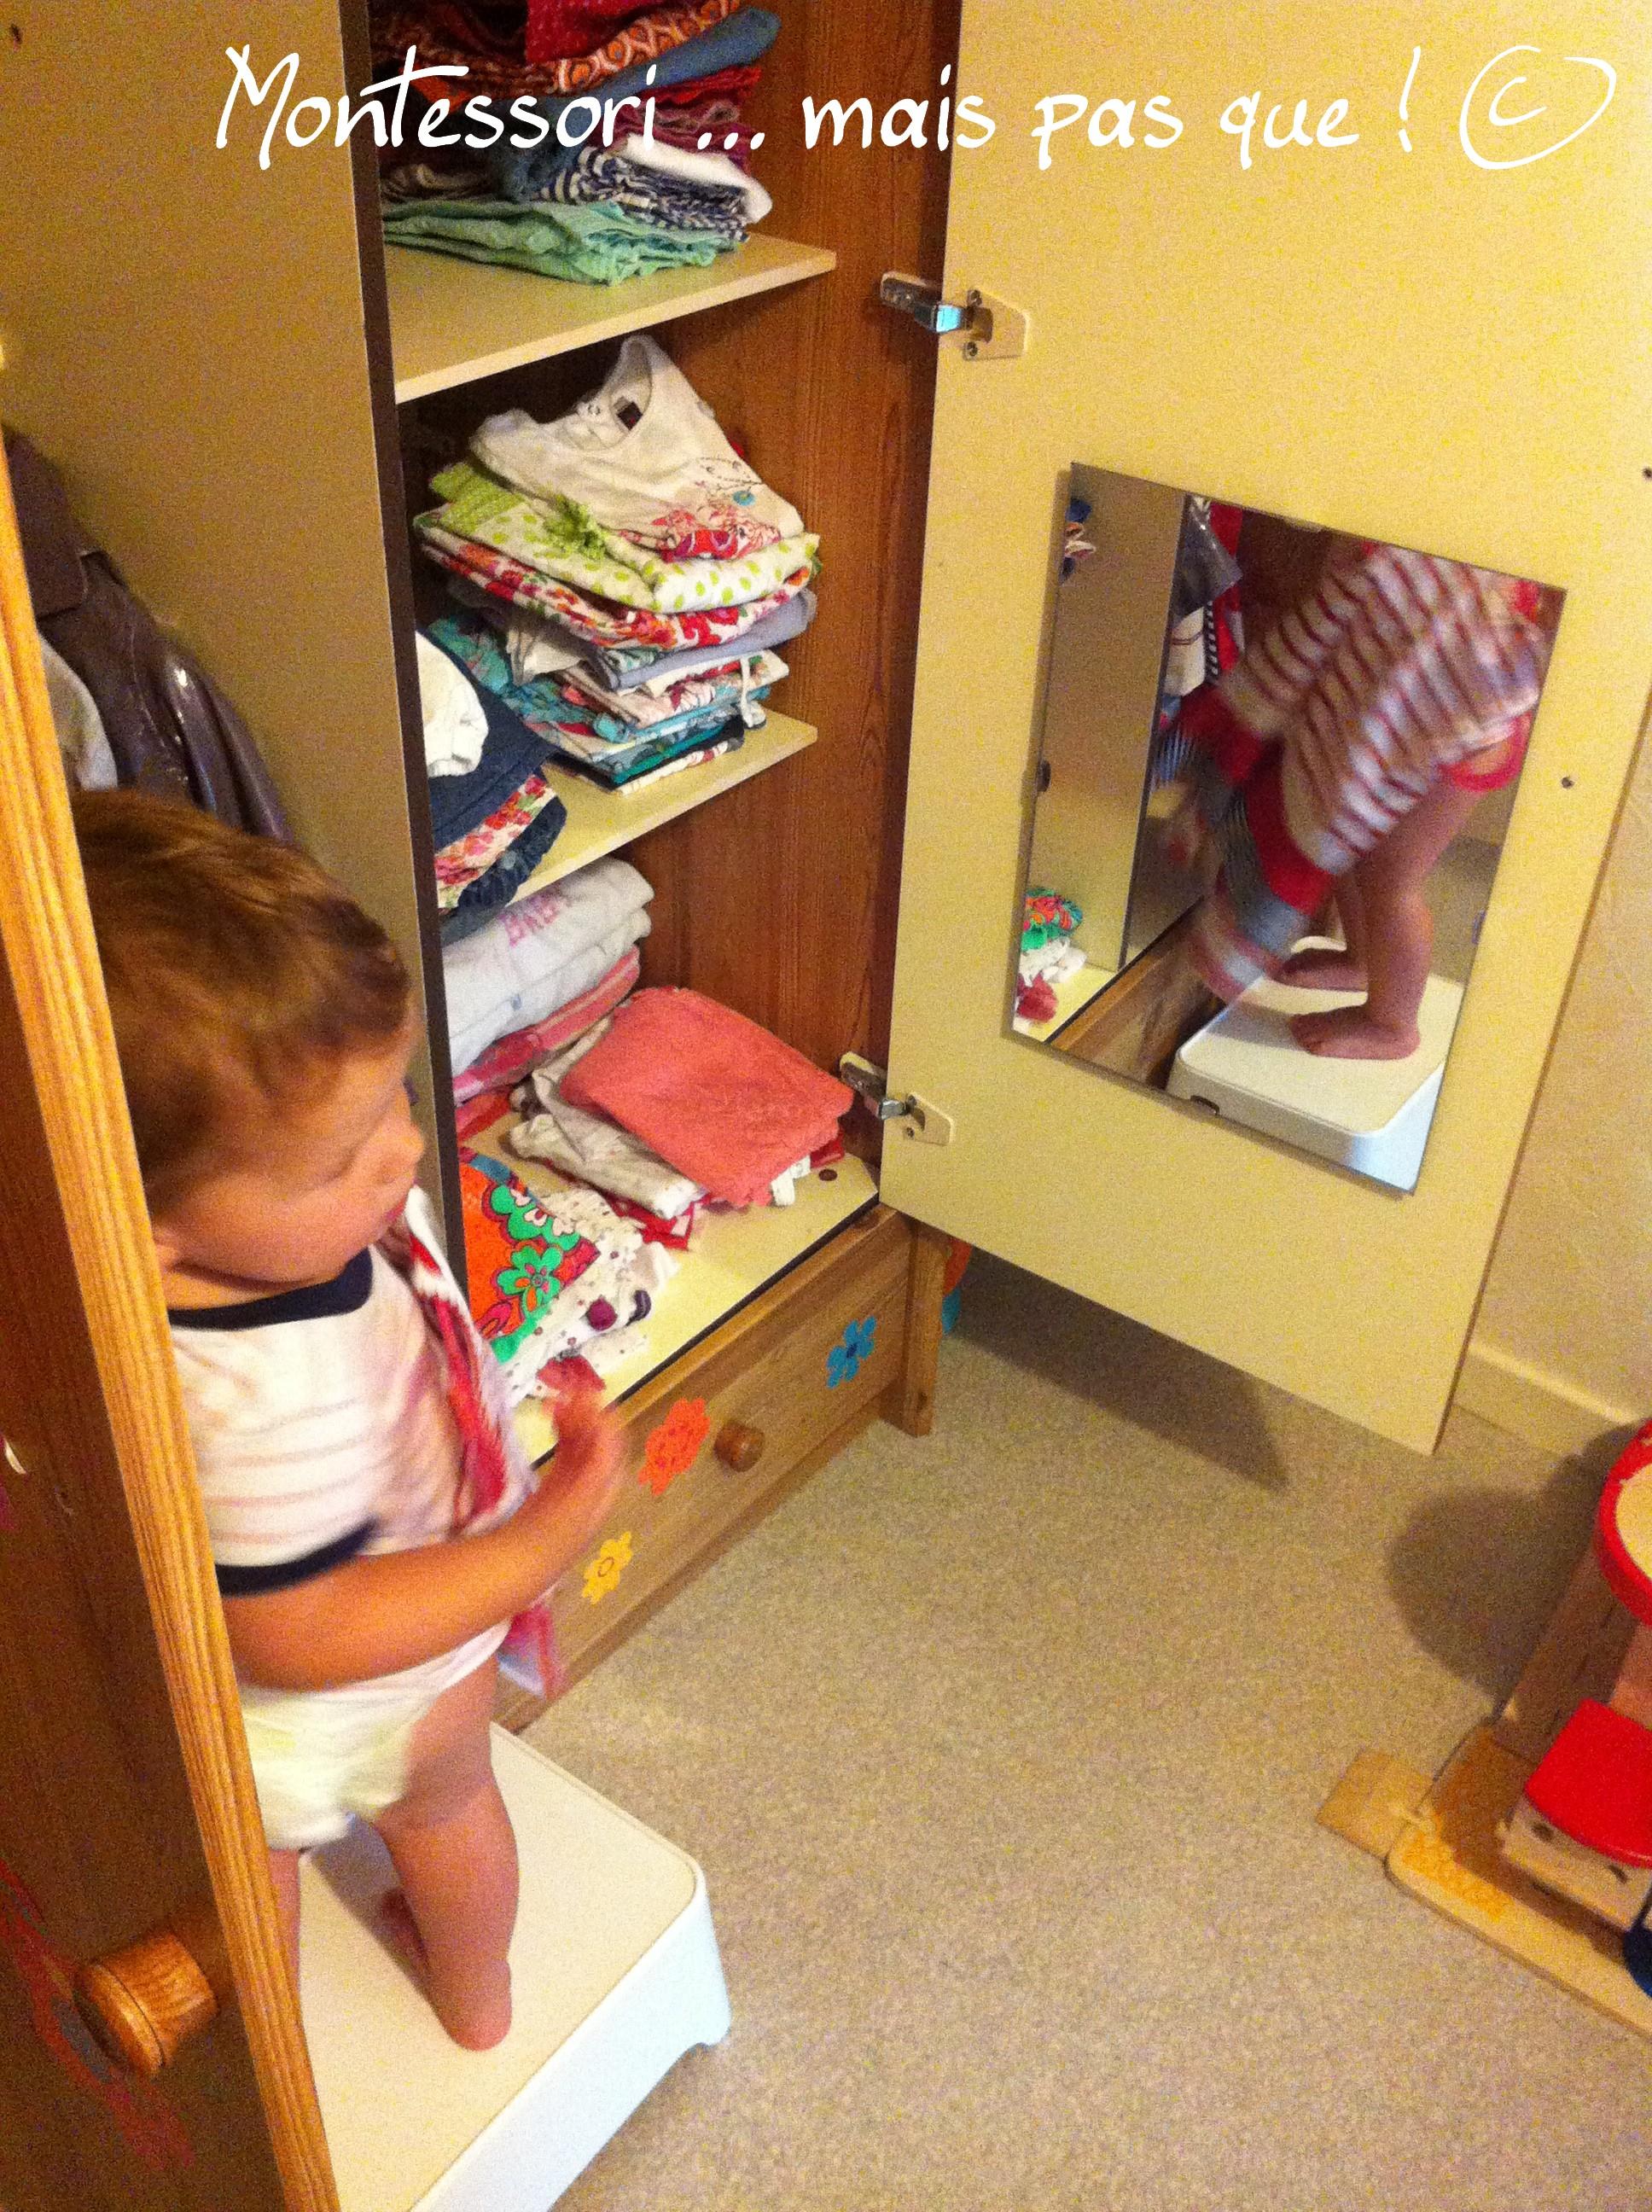 Aménagement chambre – montessori … mais pas que !